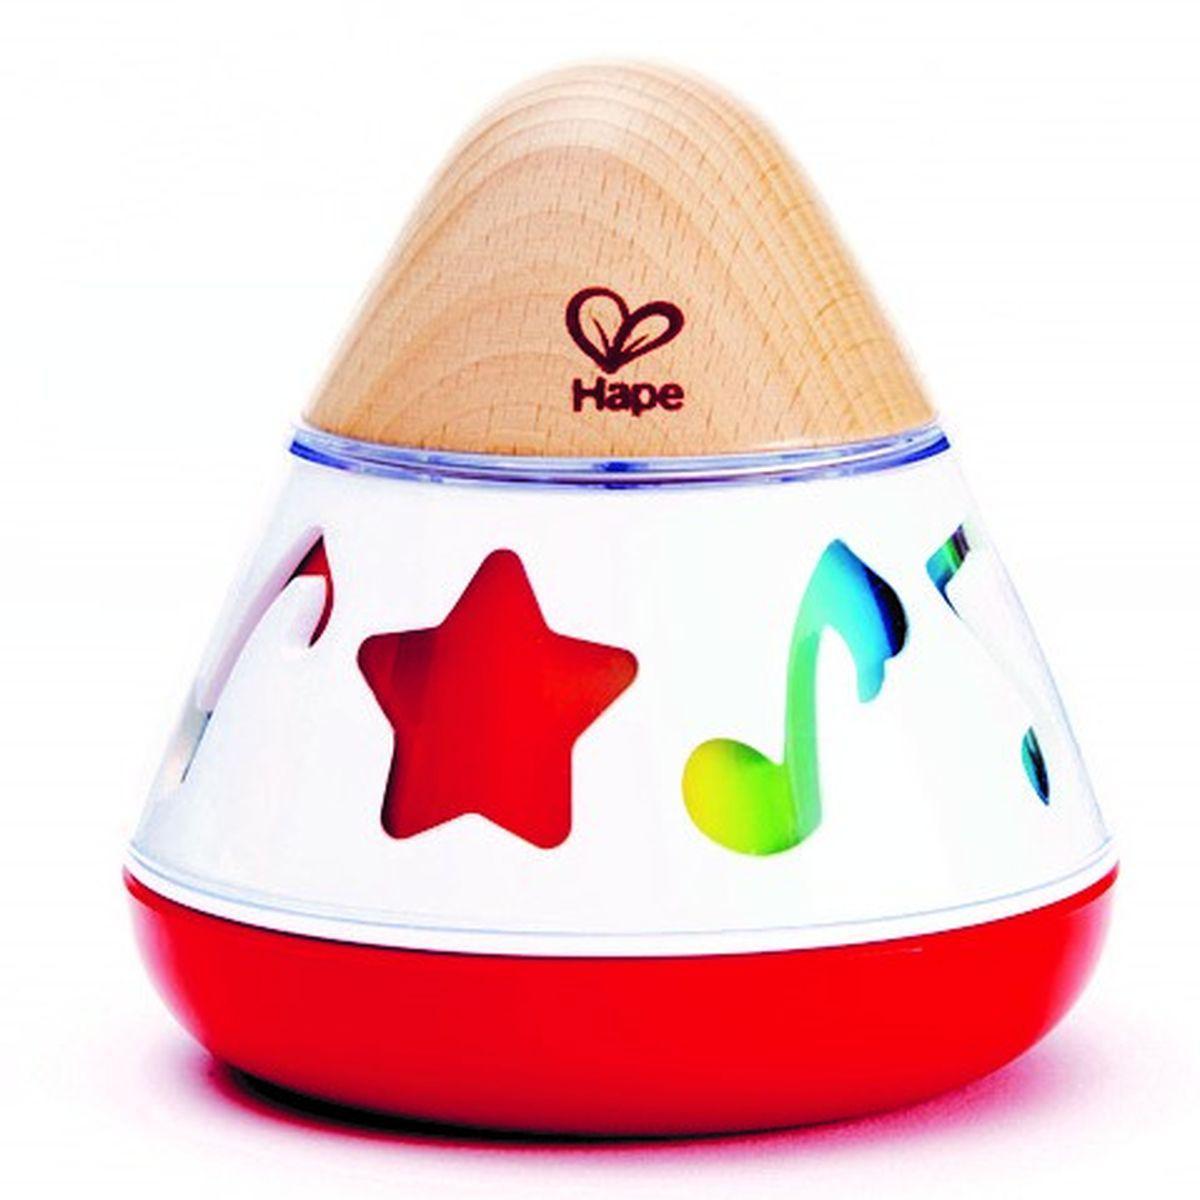 Instrument musique ROTATING MUSIC BOX Hape